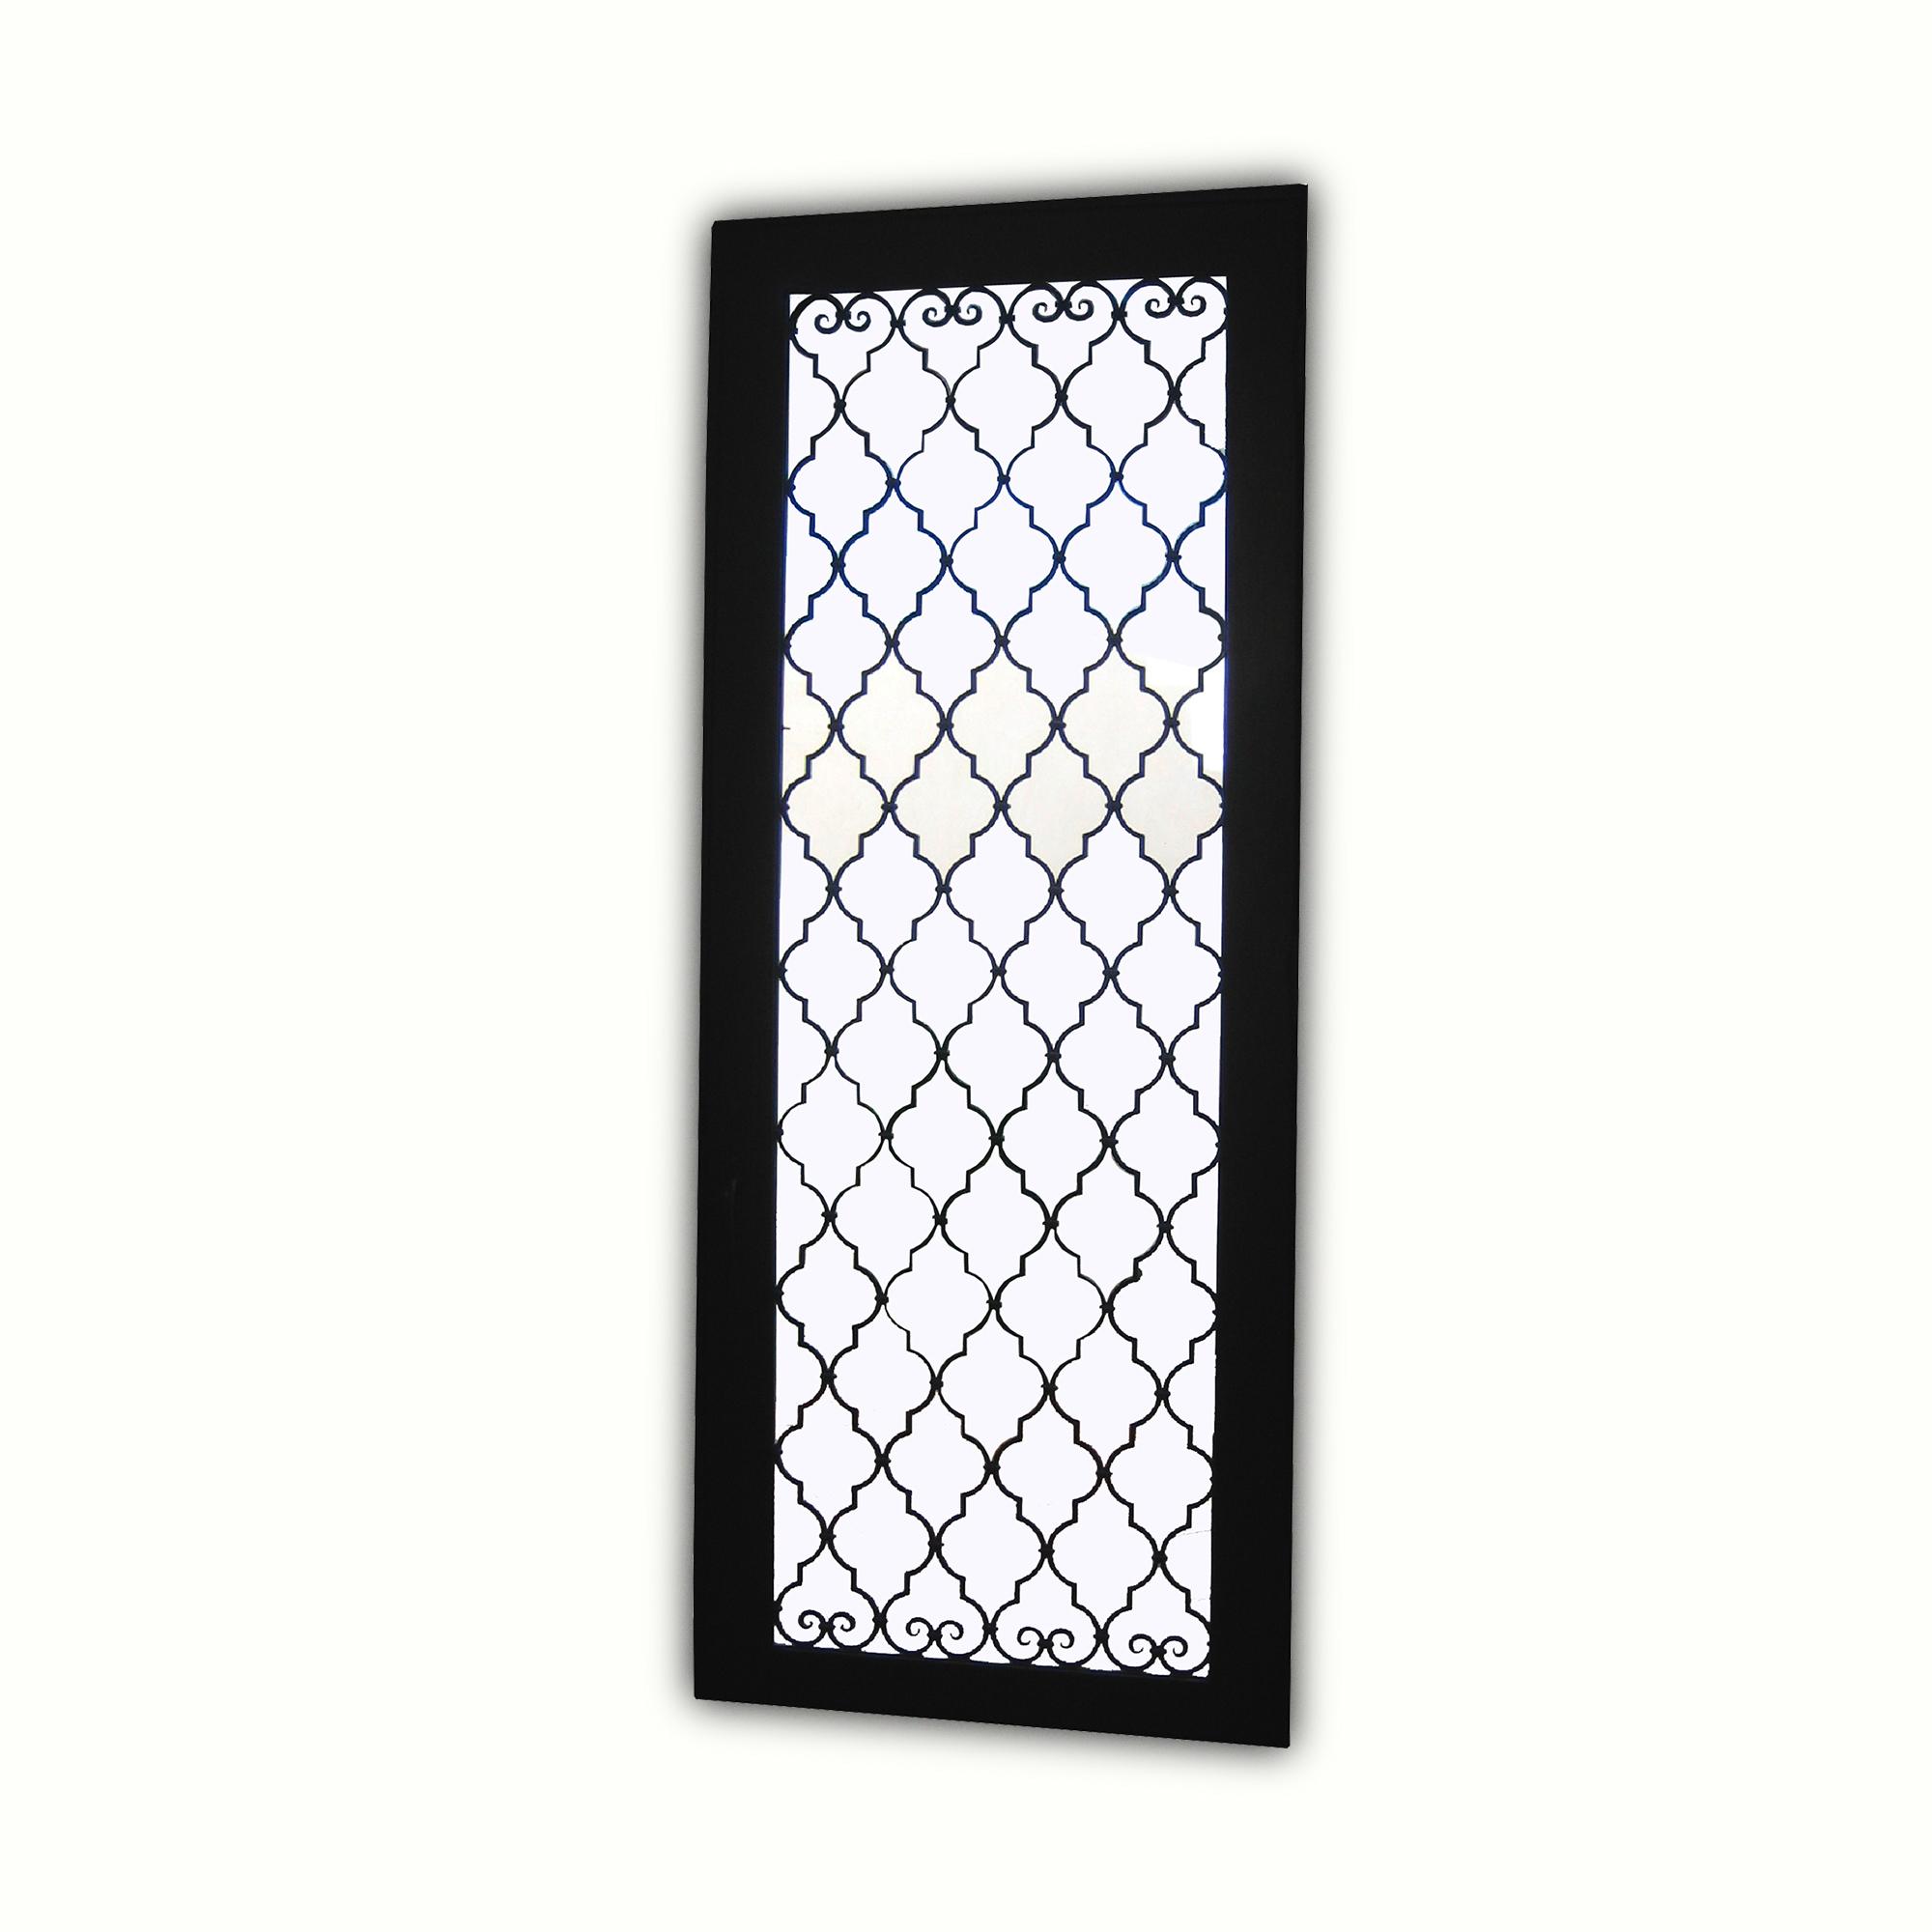 12012-ir Westlake Iron Door – ADG Lighting Collection